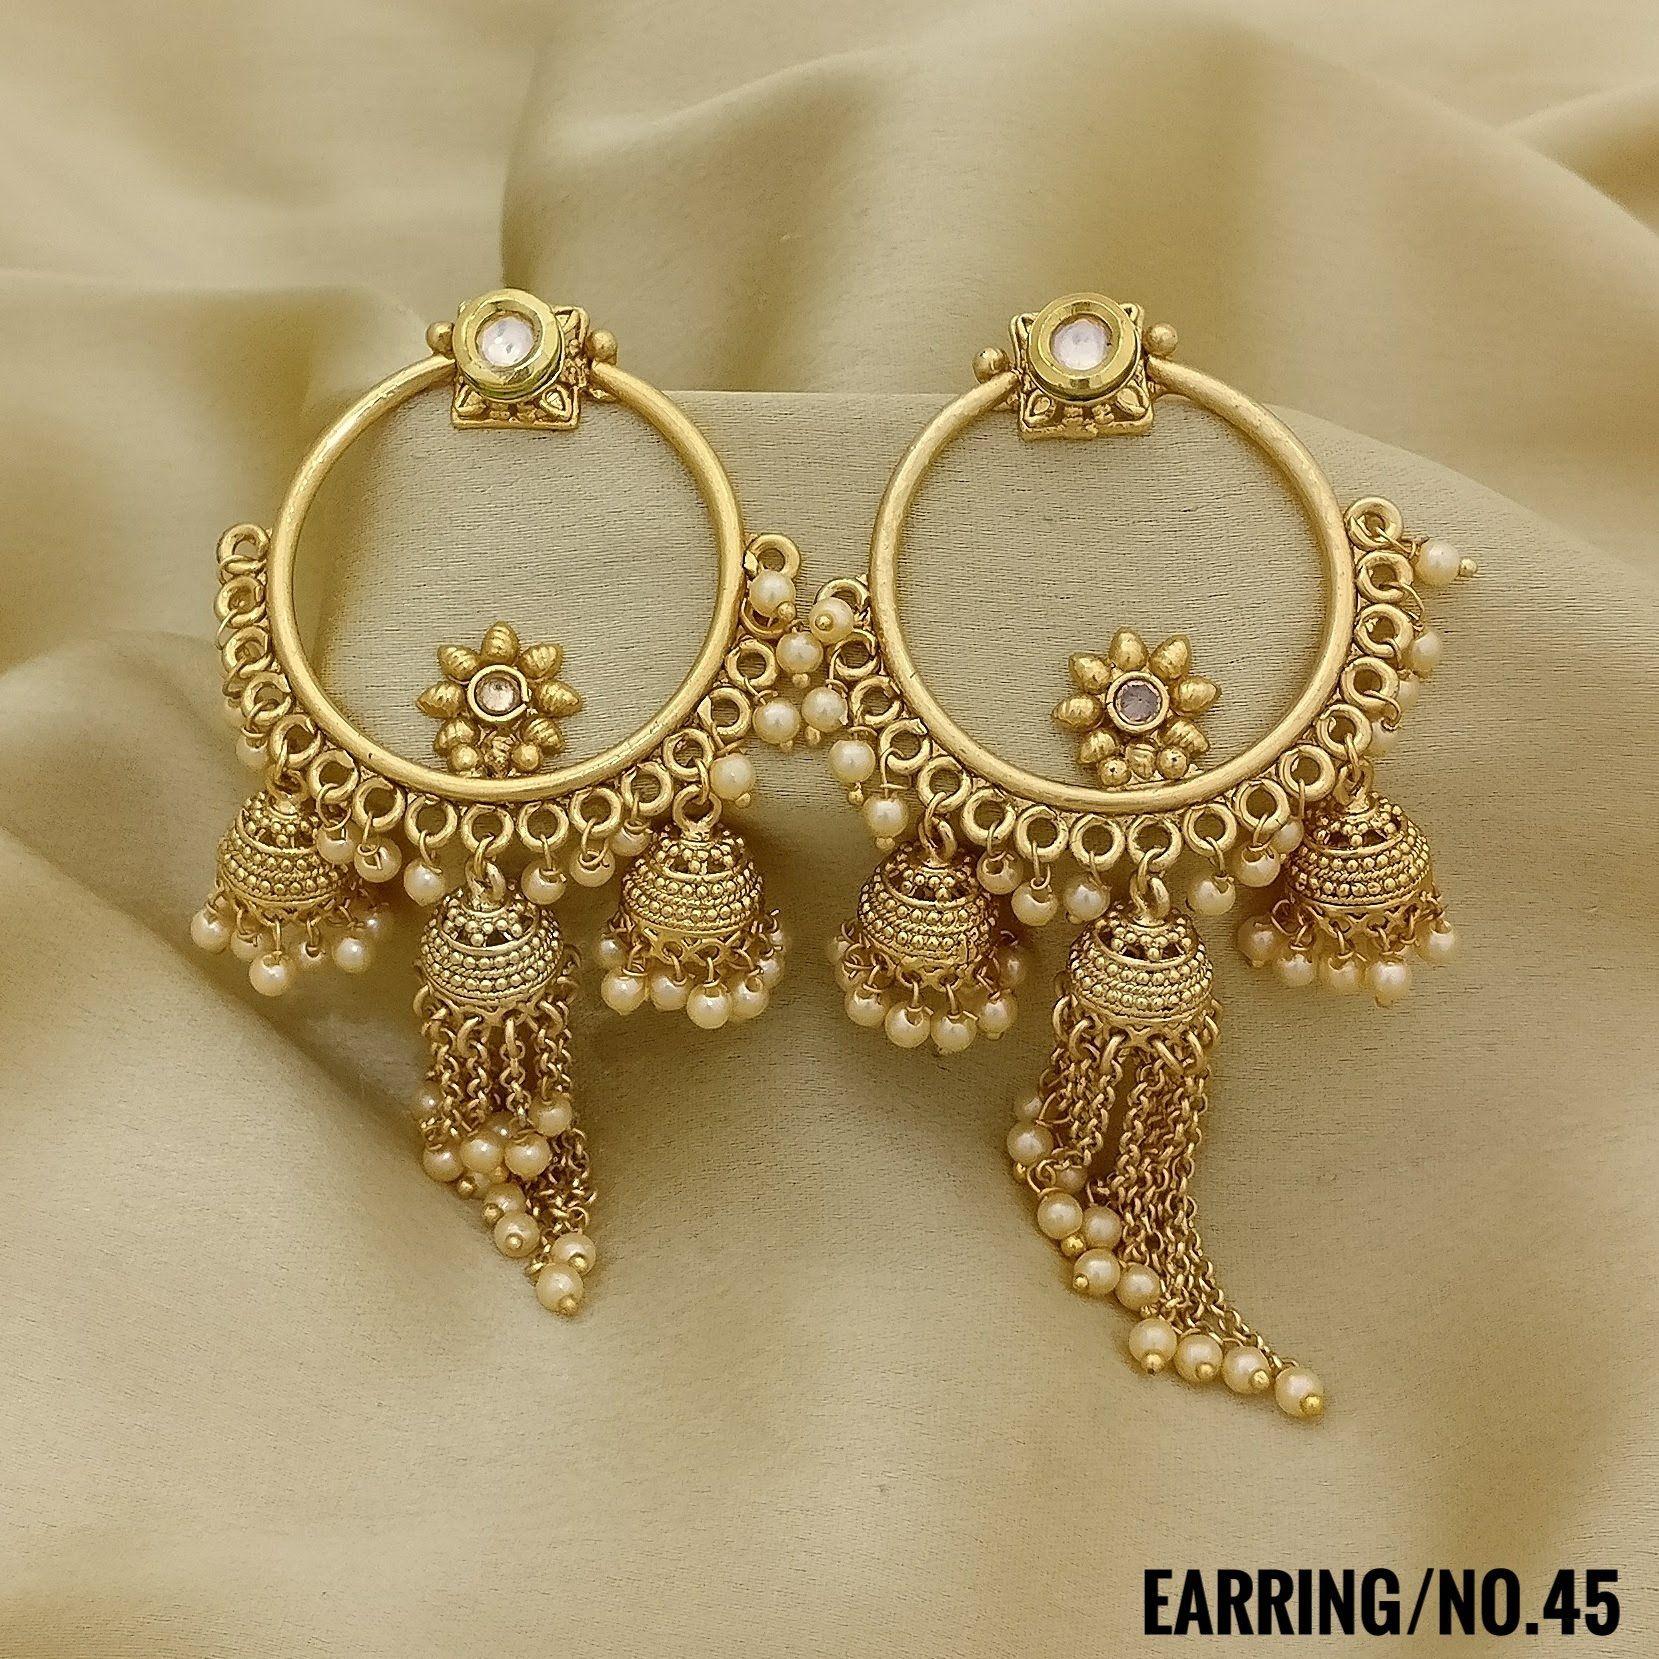 Rasrava Antique Gold Earrings Jhumki Style With Wedding Earrings